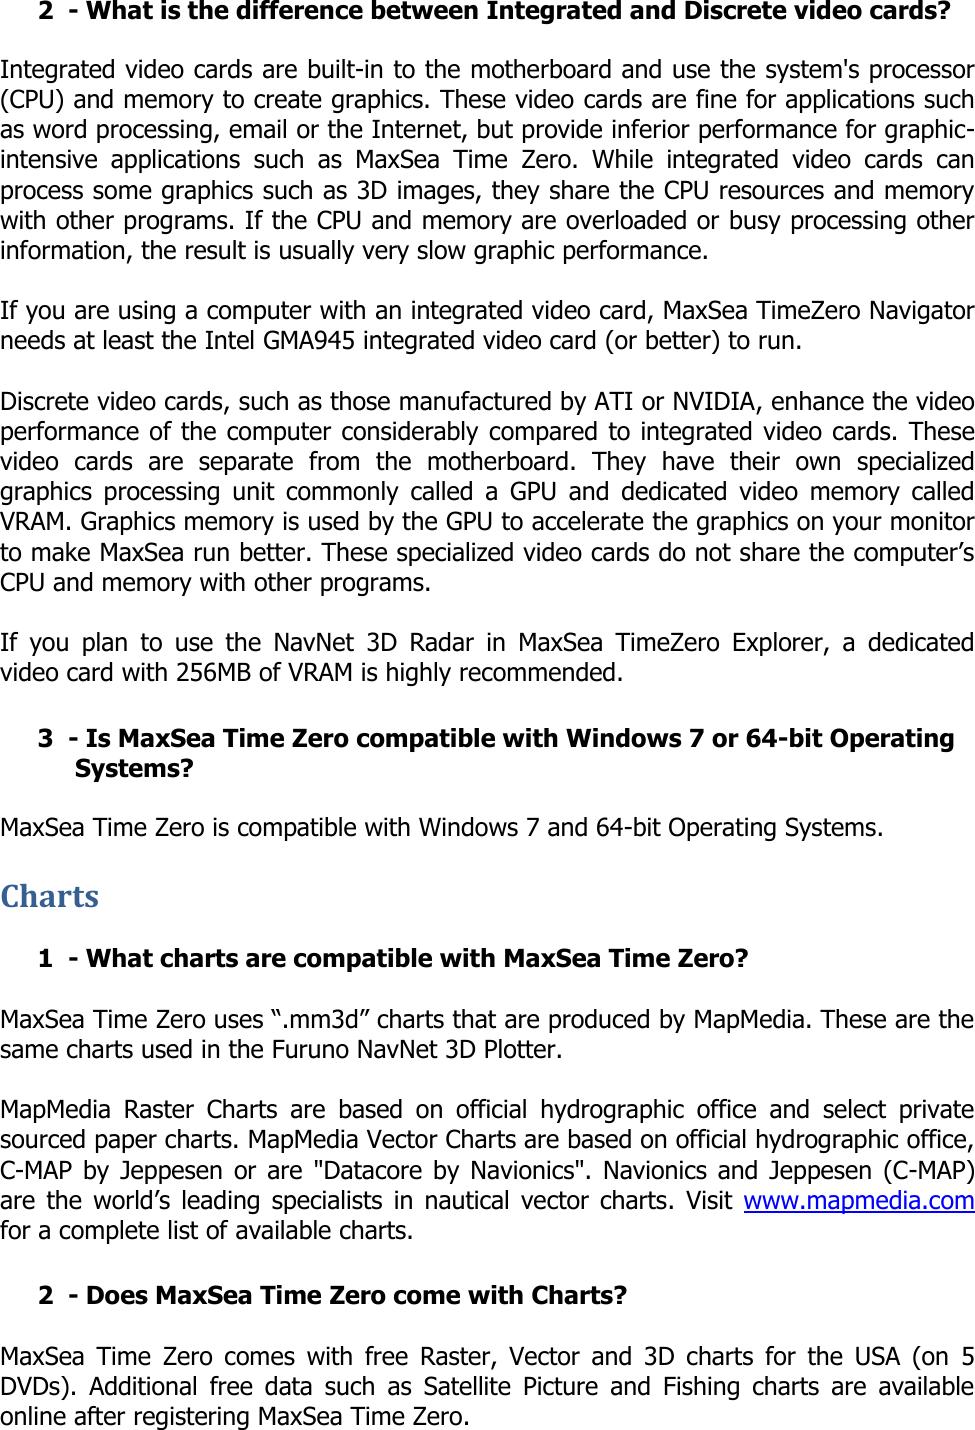 Furuno Tz Explorer Users Manual MaxSea TimeZero FAQ